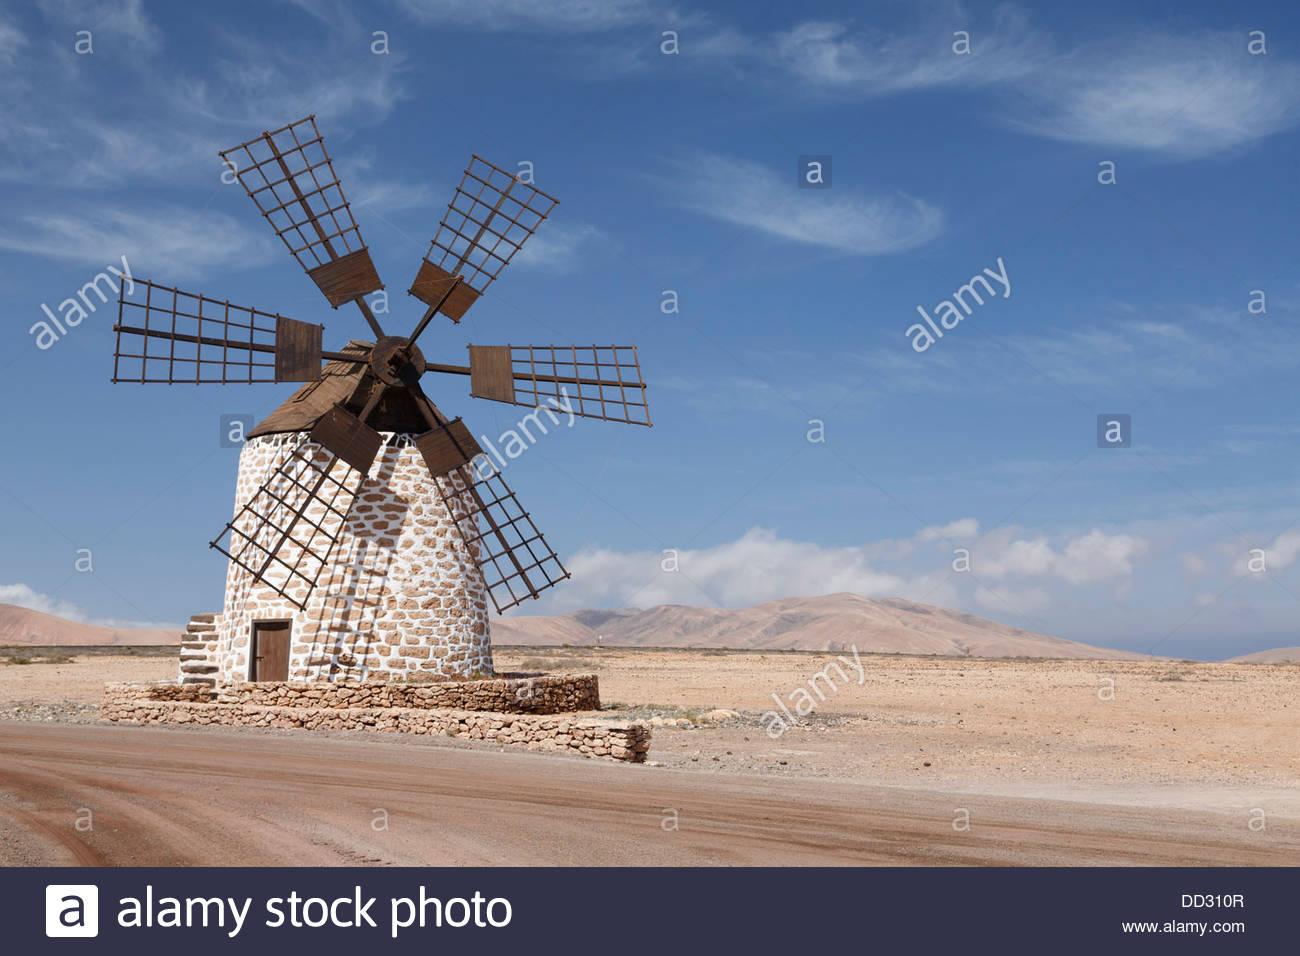 Old windmill or molino in Tefia, Fuerteventura, Canary Islands - Stock Image